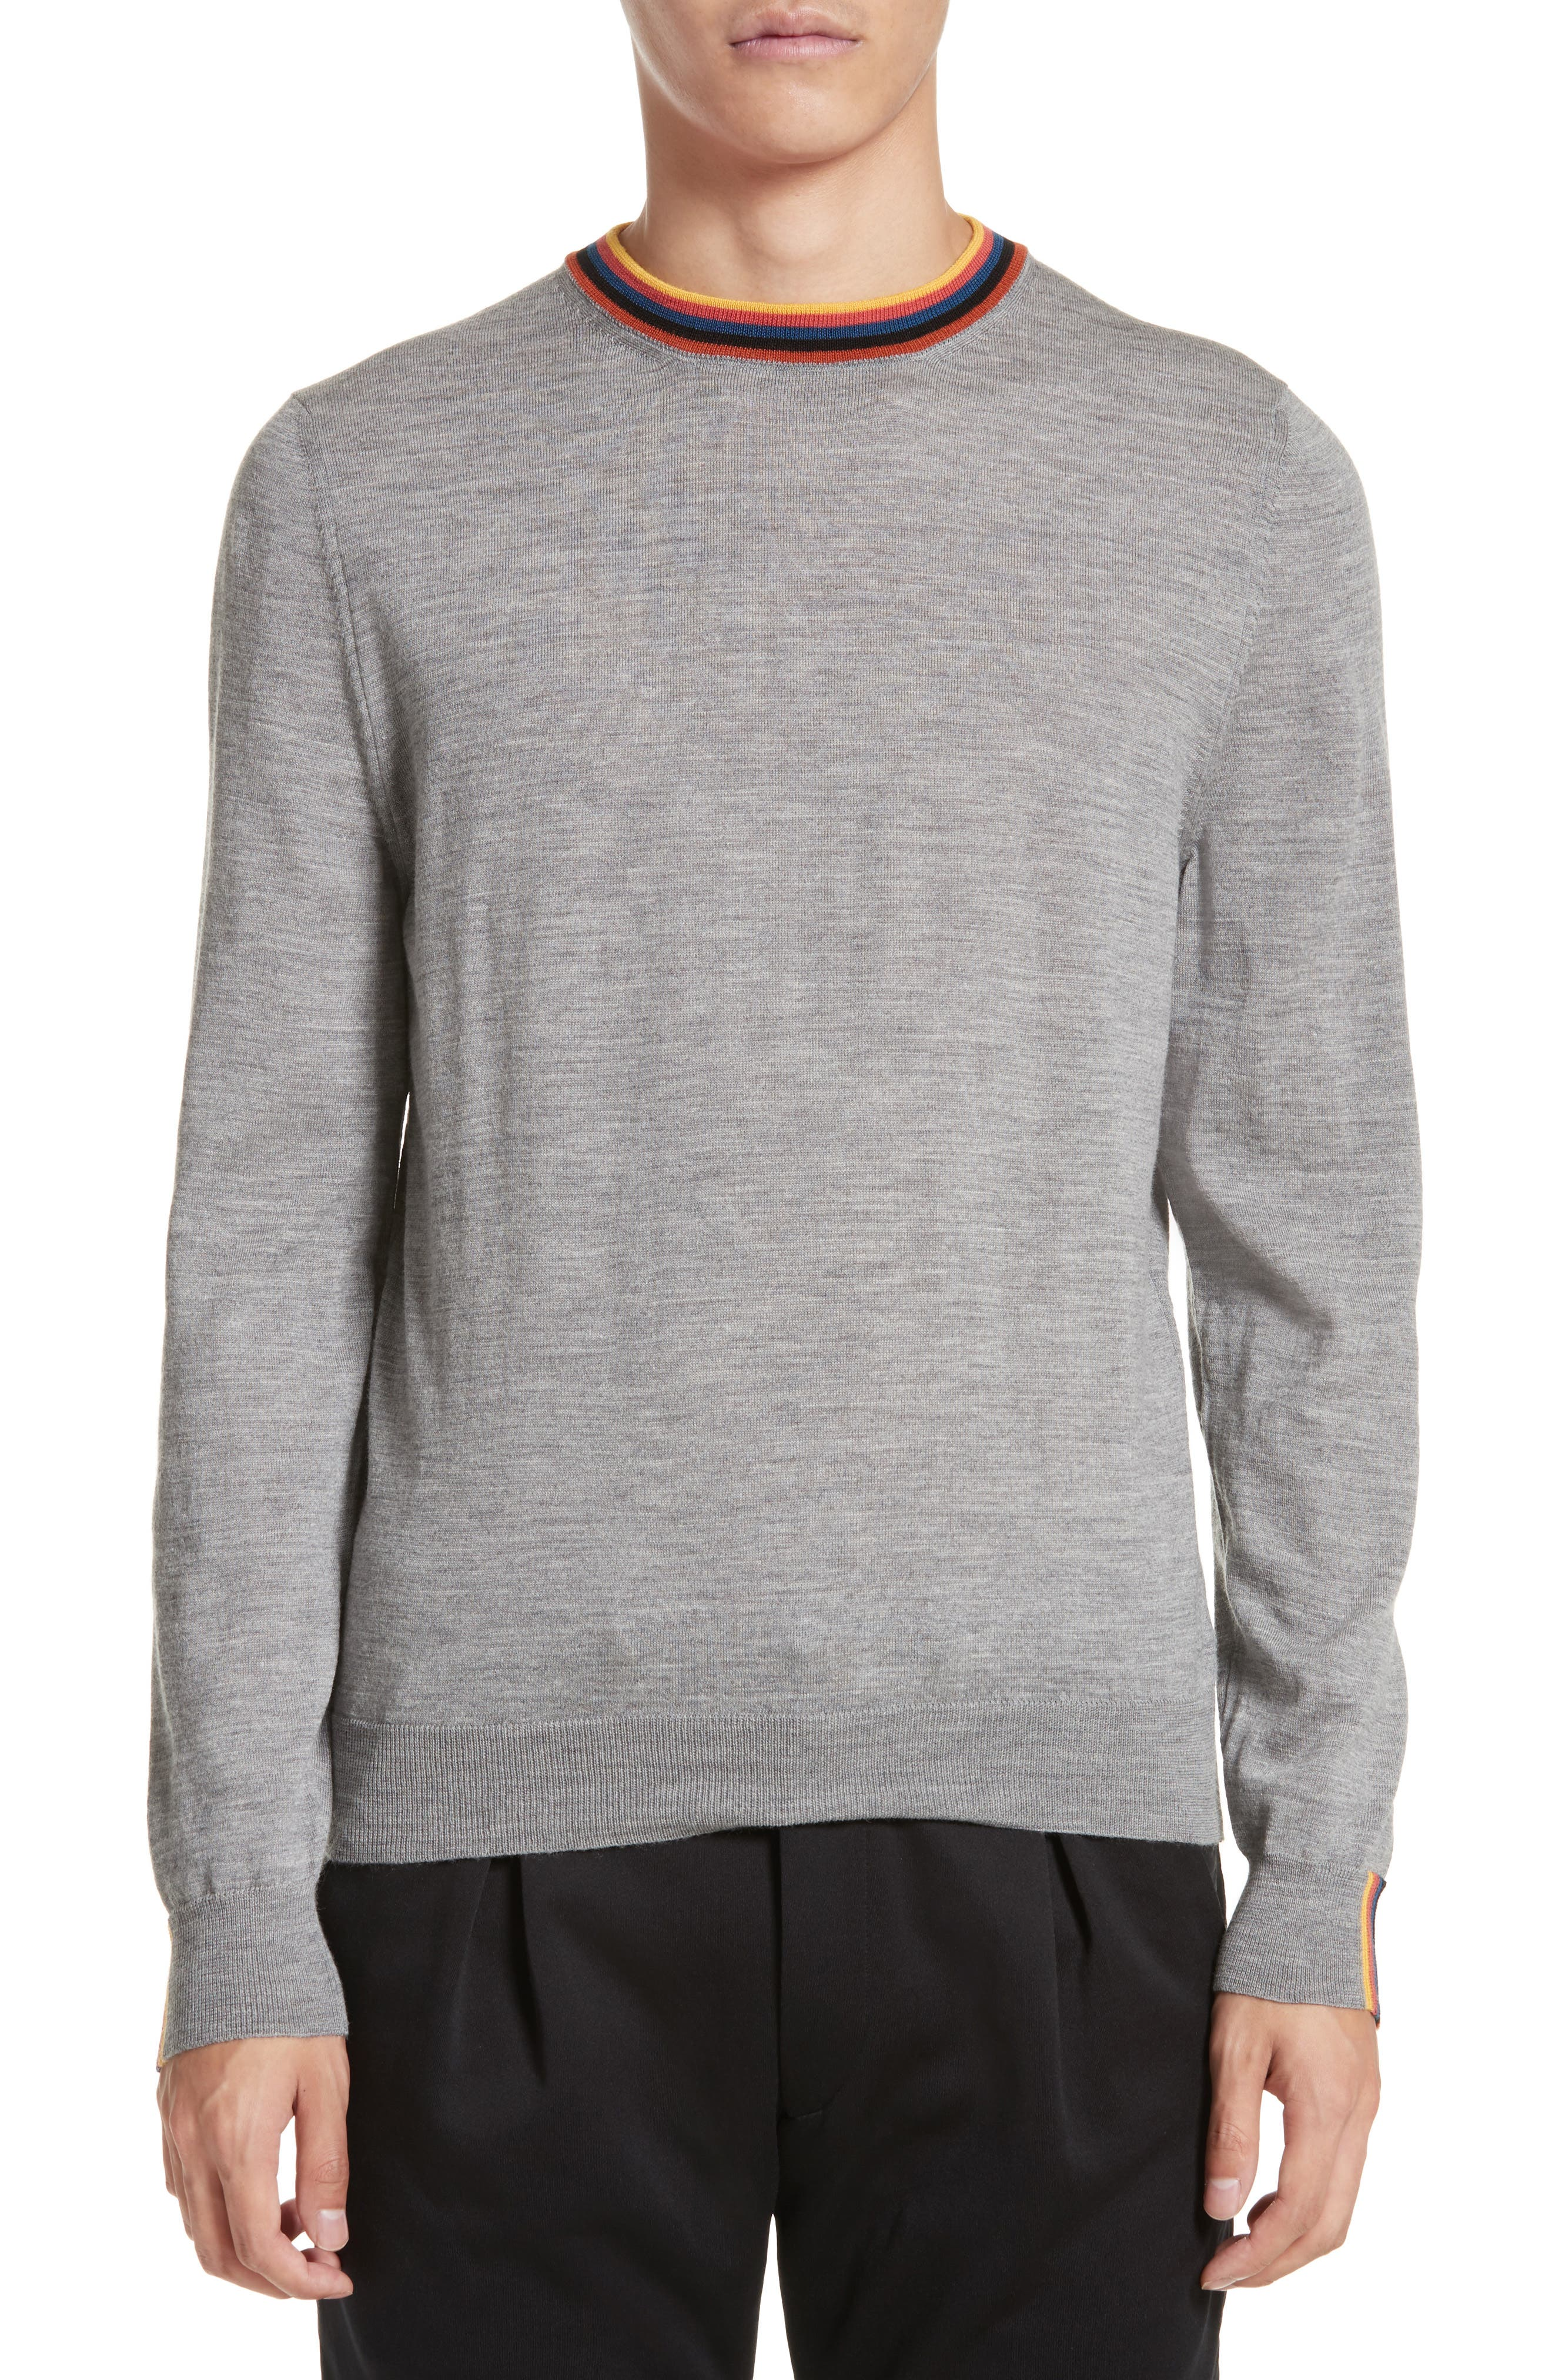 Artist Stripe Merino Wool Sweater,                             Main thumbnail 1, color,                             Grey